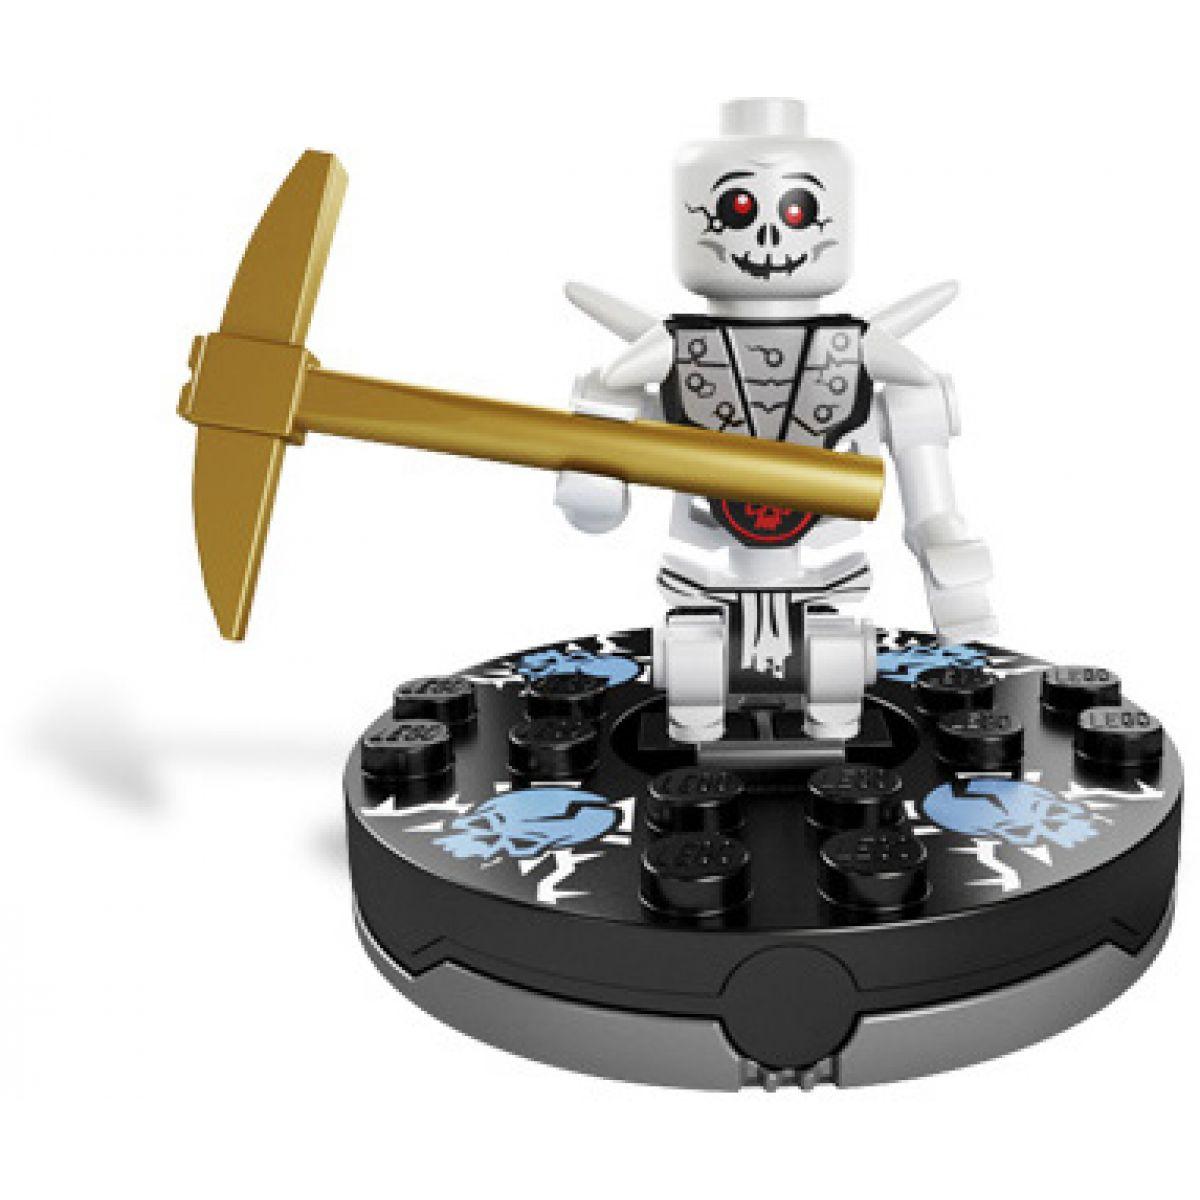 LEGO 2115 Ninjago Bonezai